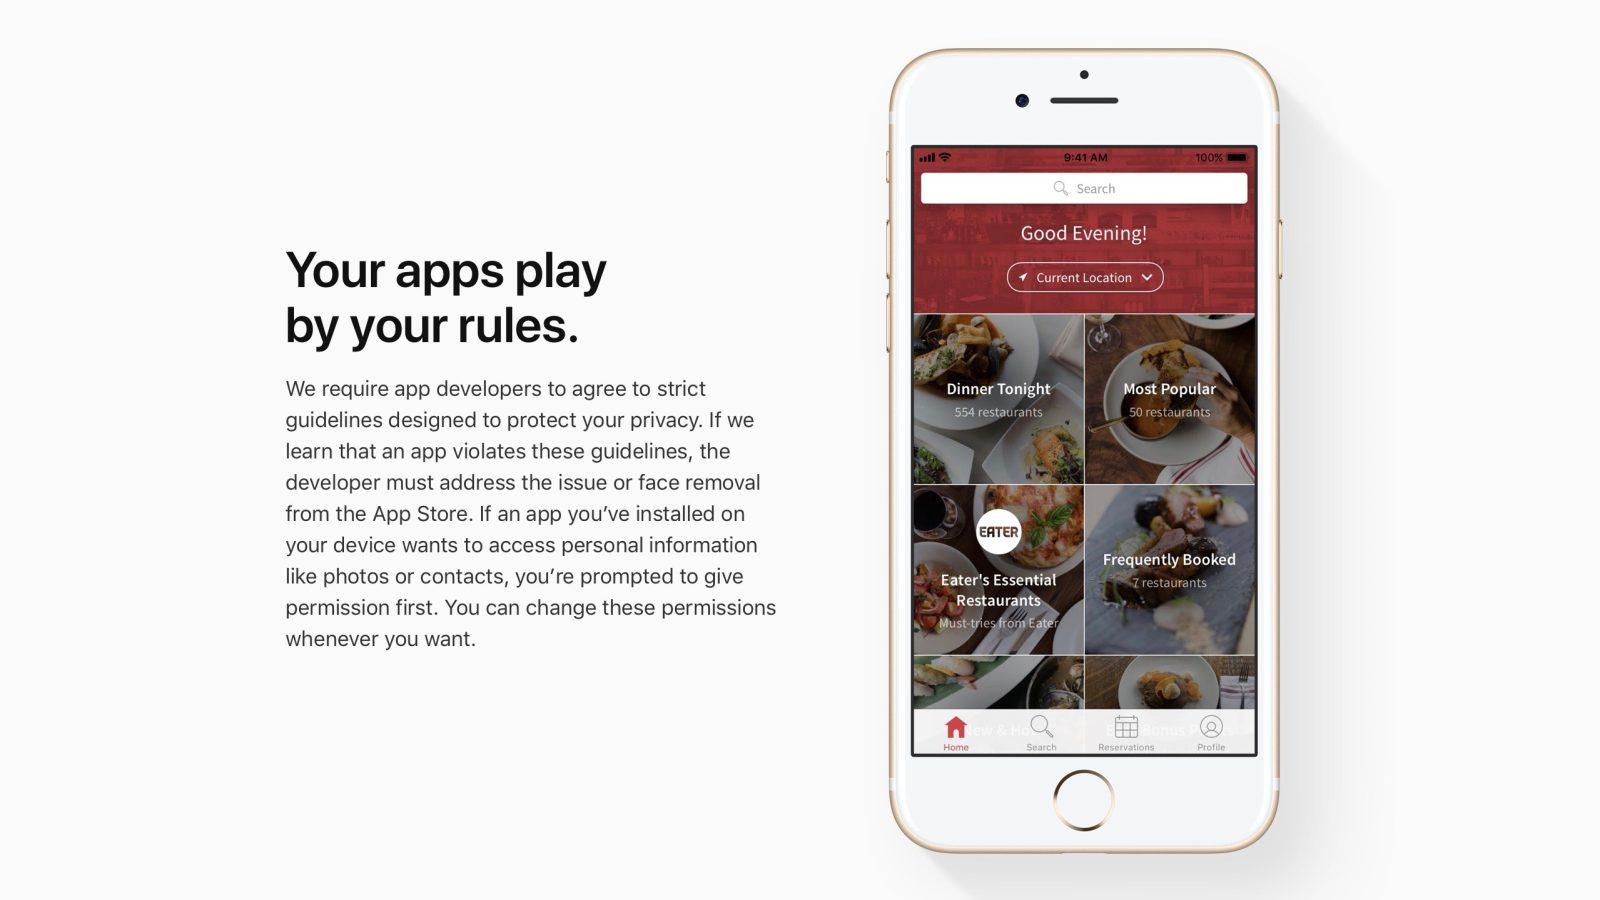 apple privacy apps - تعرف على كيفية التحقق من التطبيقات التي بإمكانها الوصول إلى كاميرا وميكروفون هاتف iPhone